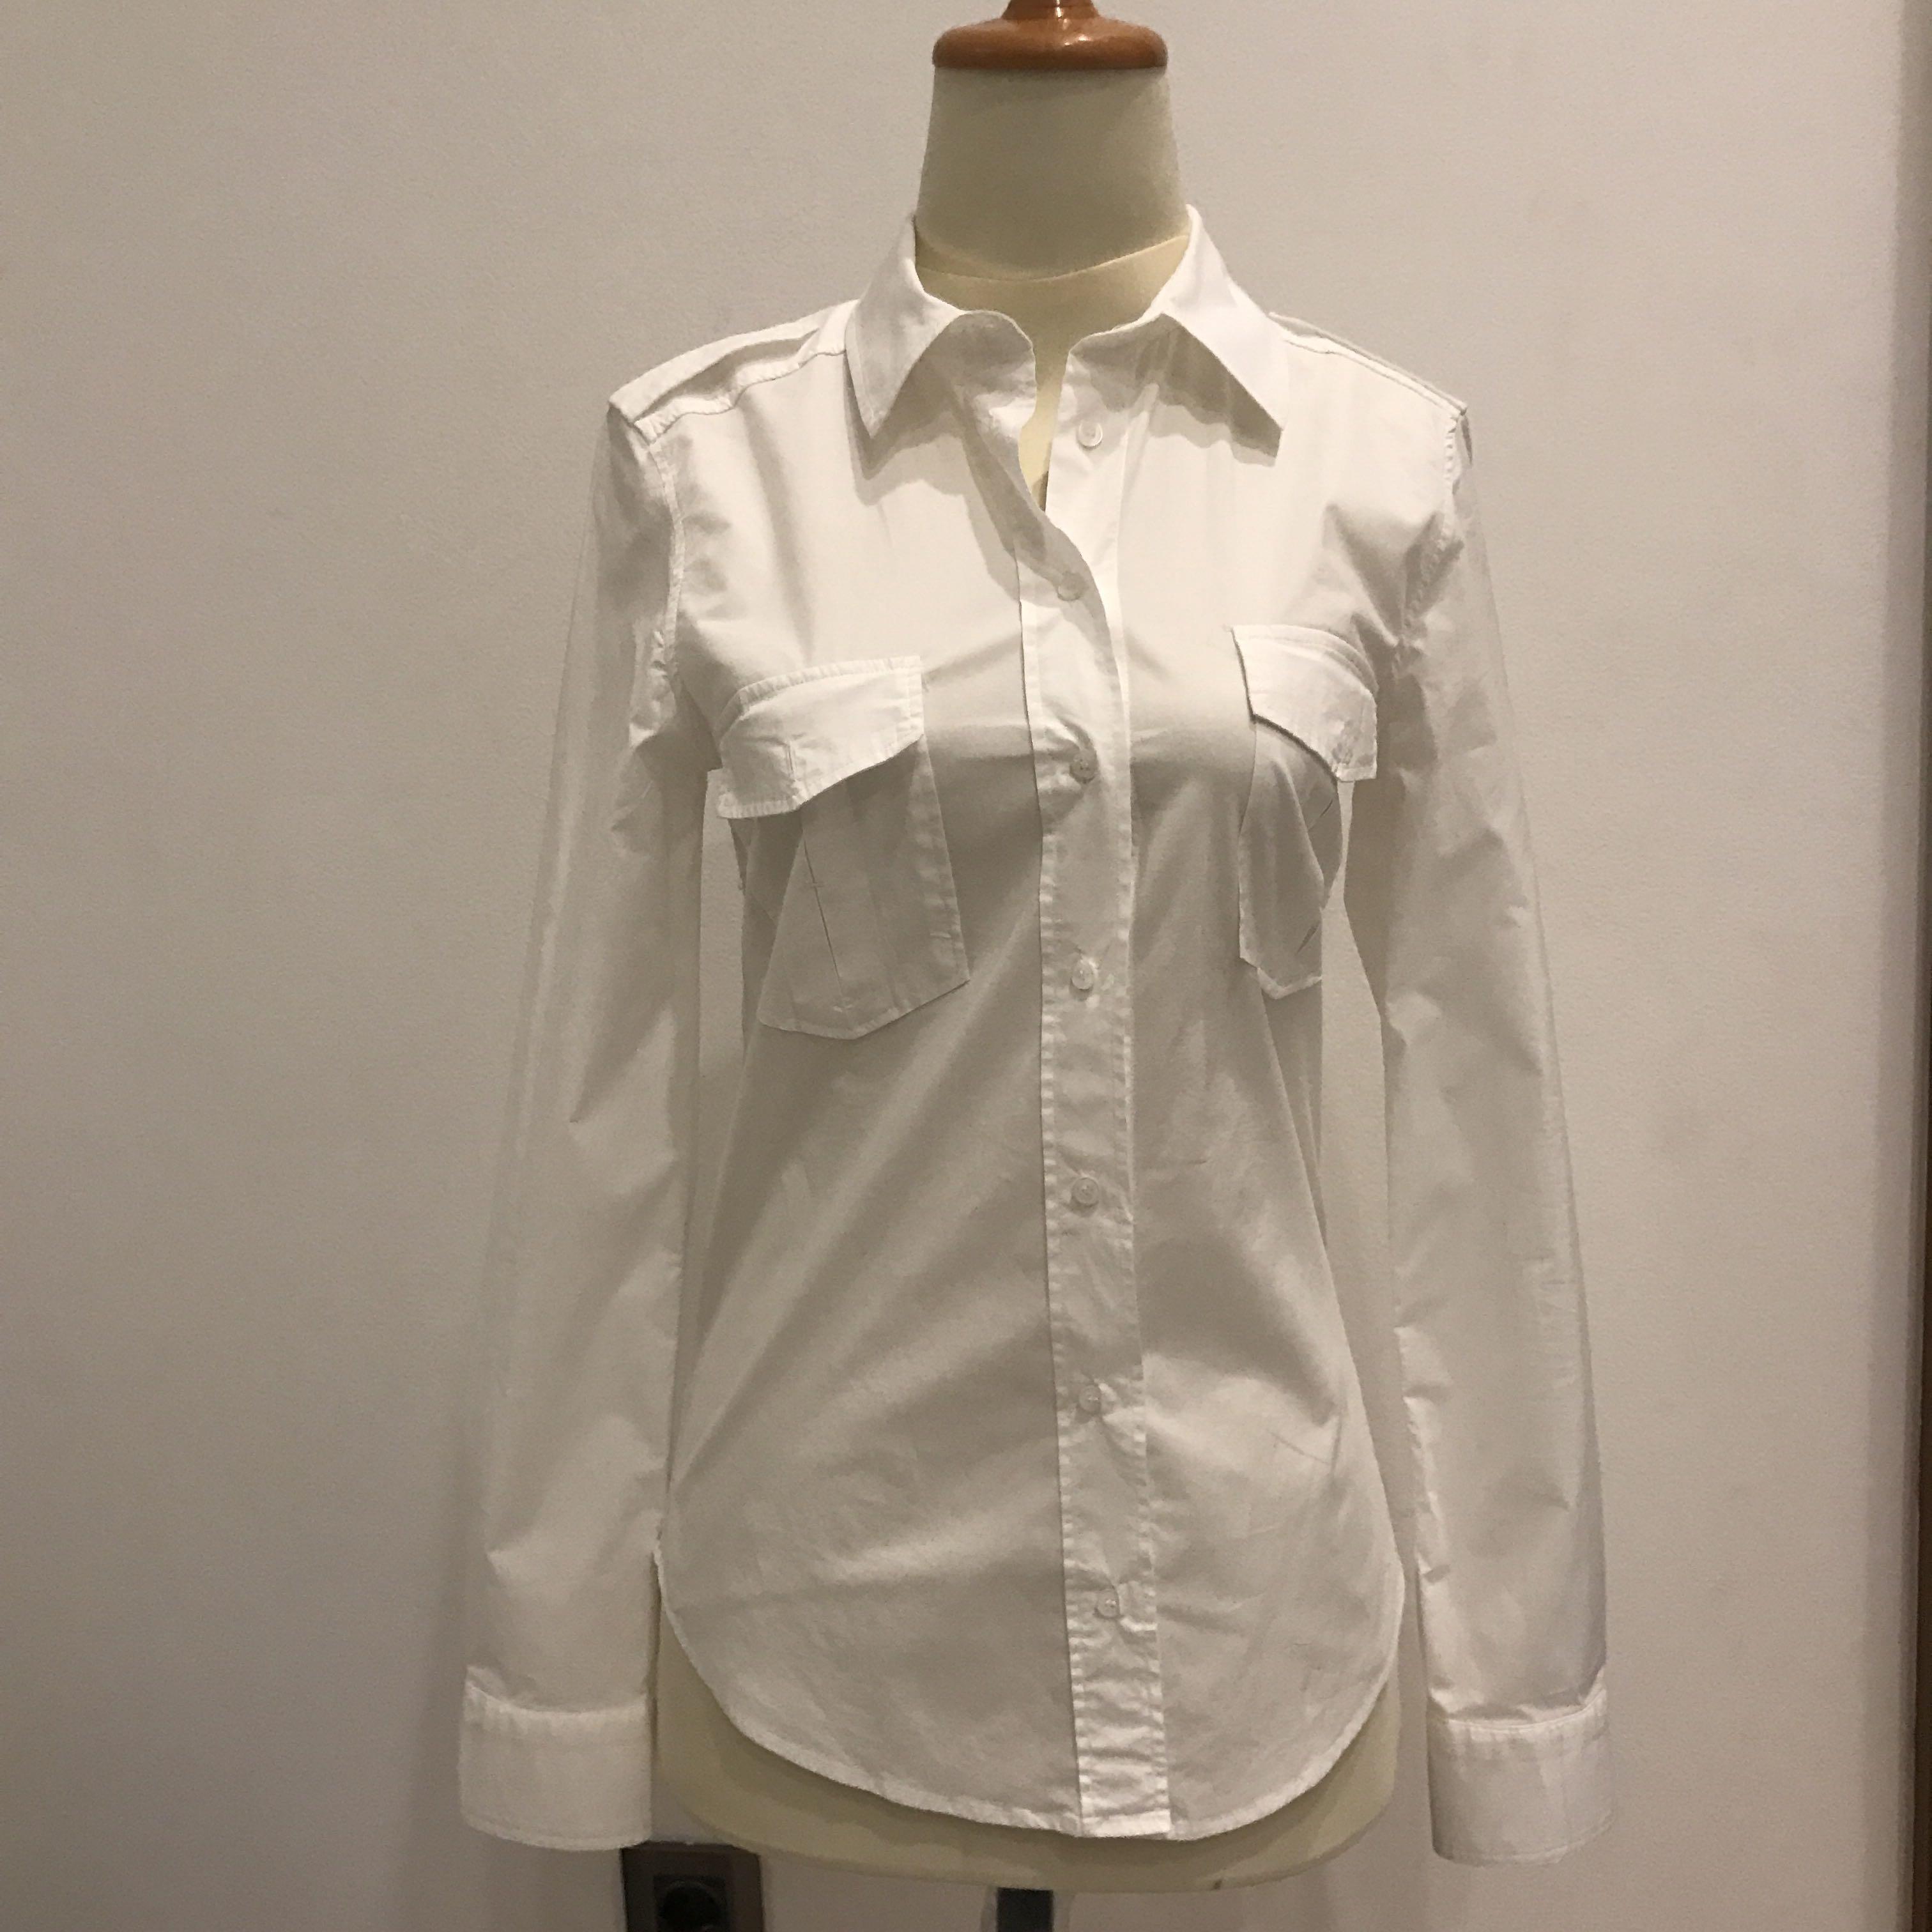 Zara Basic white shirt